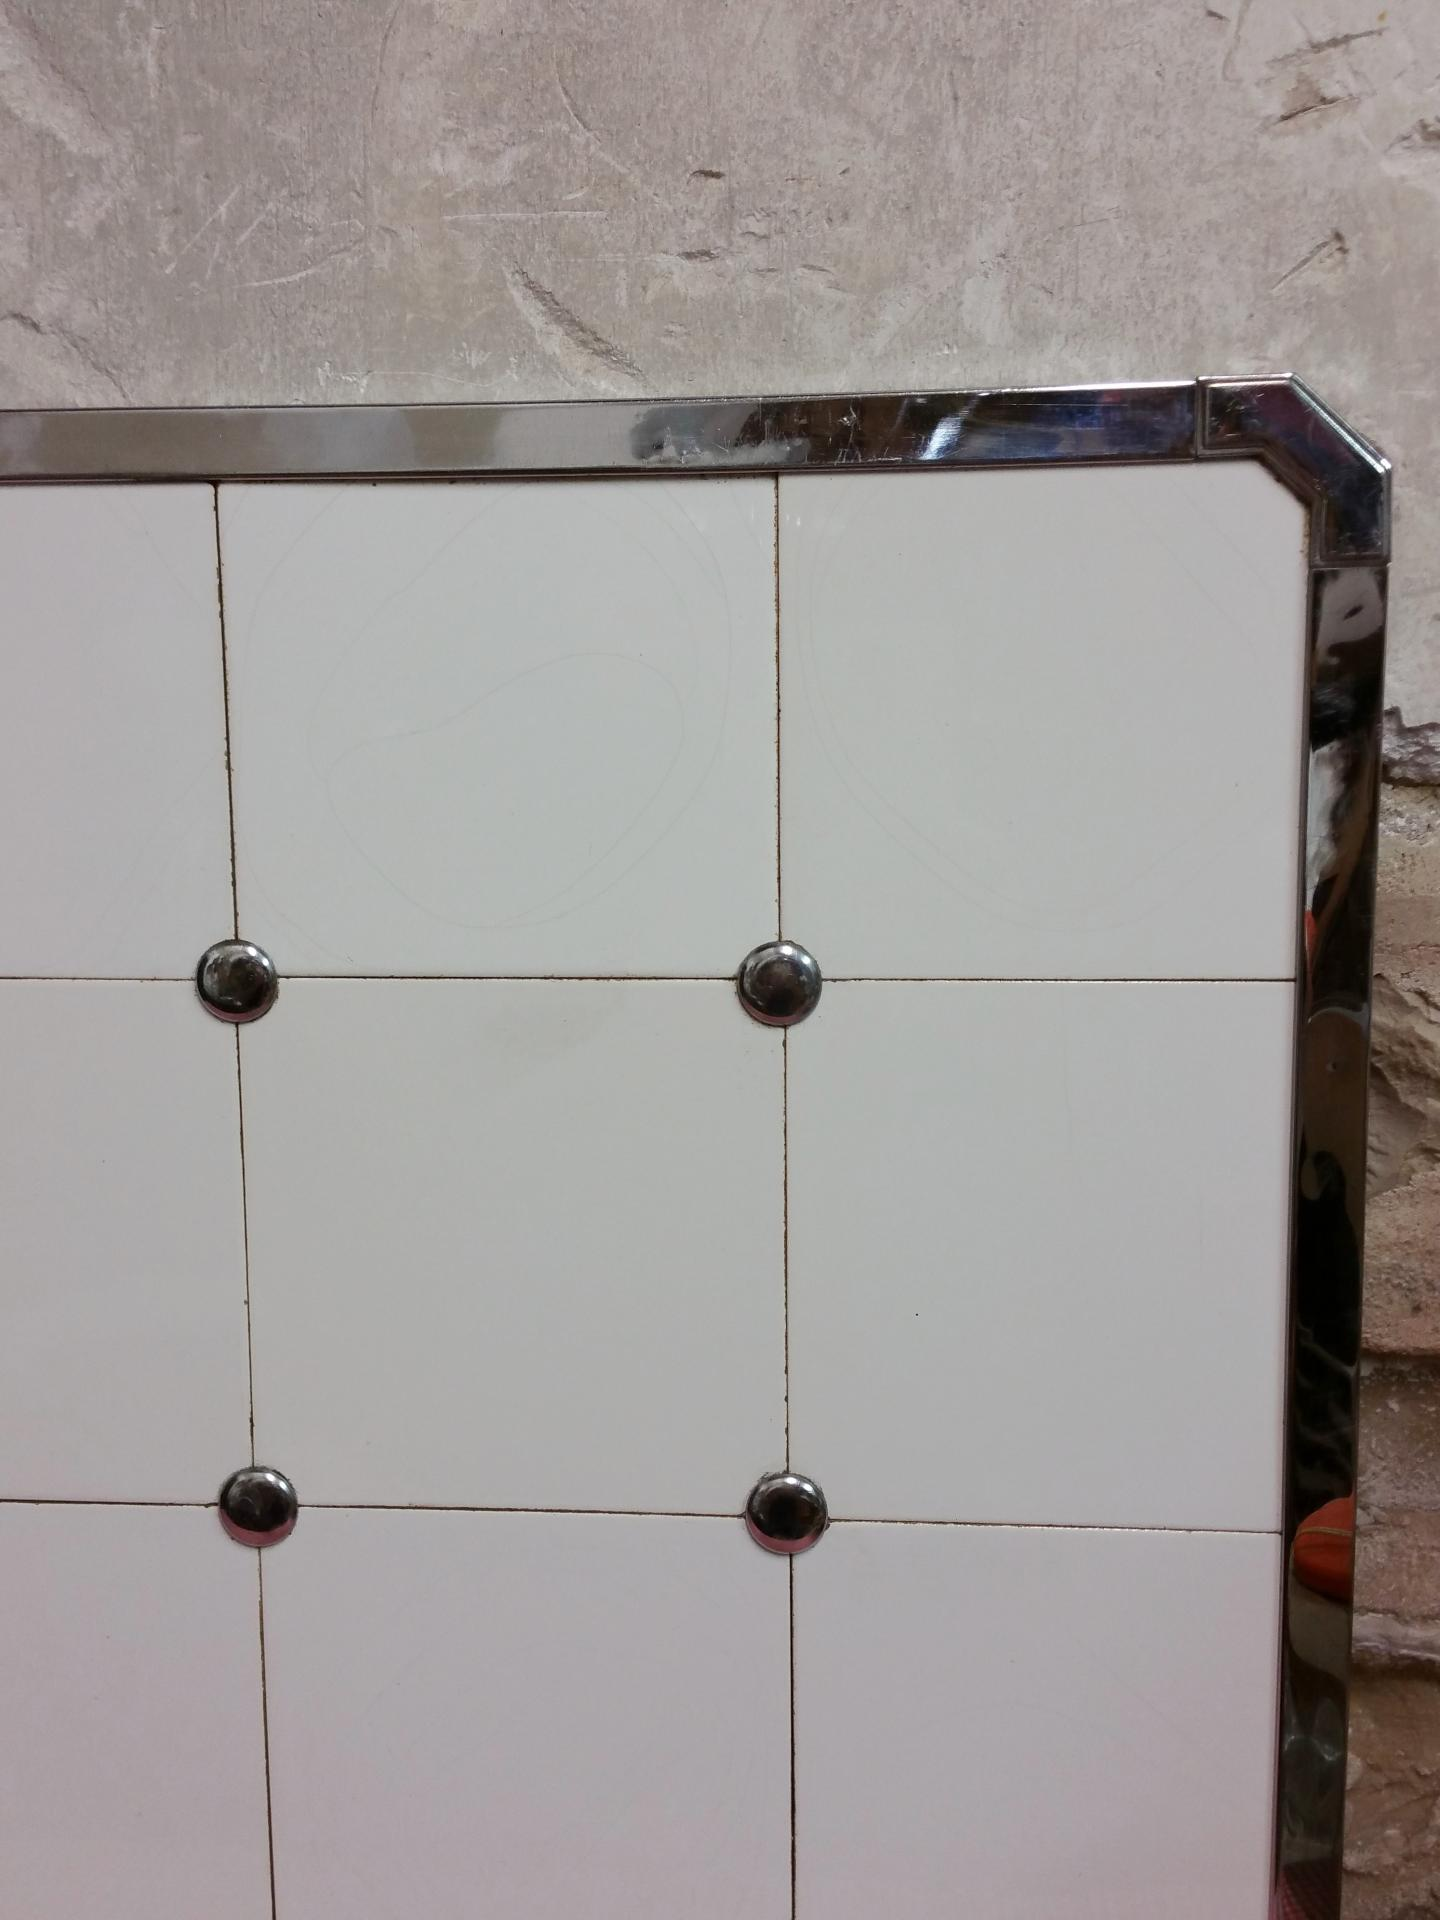 ancienne cr dence de cuisine cr dence en carreaux de fa ence blanche. Black Bedroom Furniture Sets. Home Design Ideas